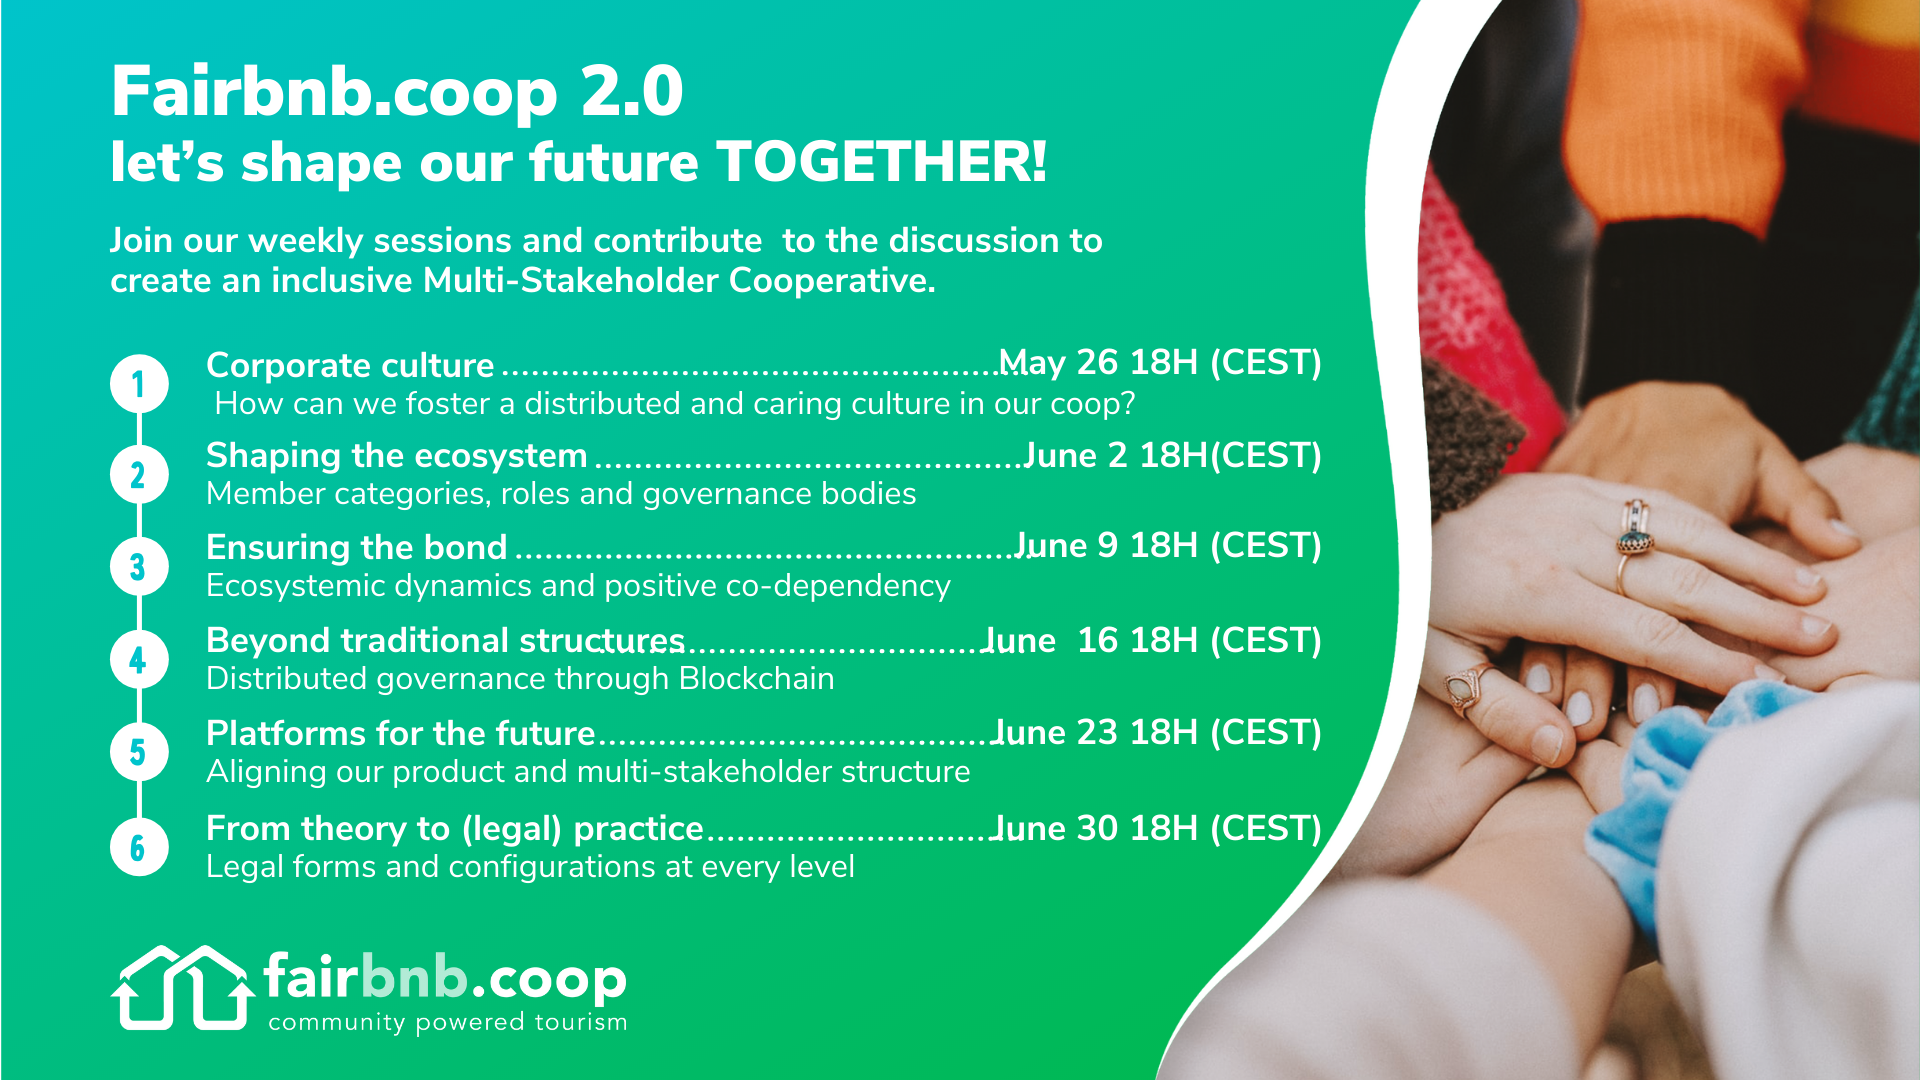 FUTURE COOP new platform